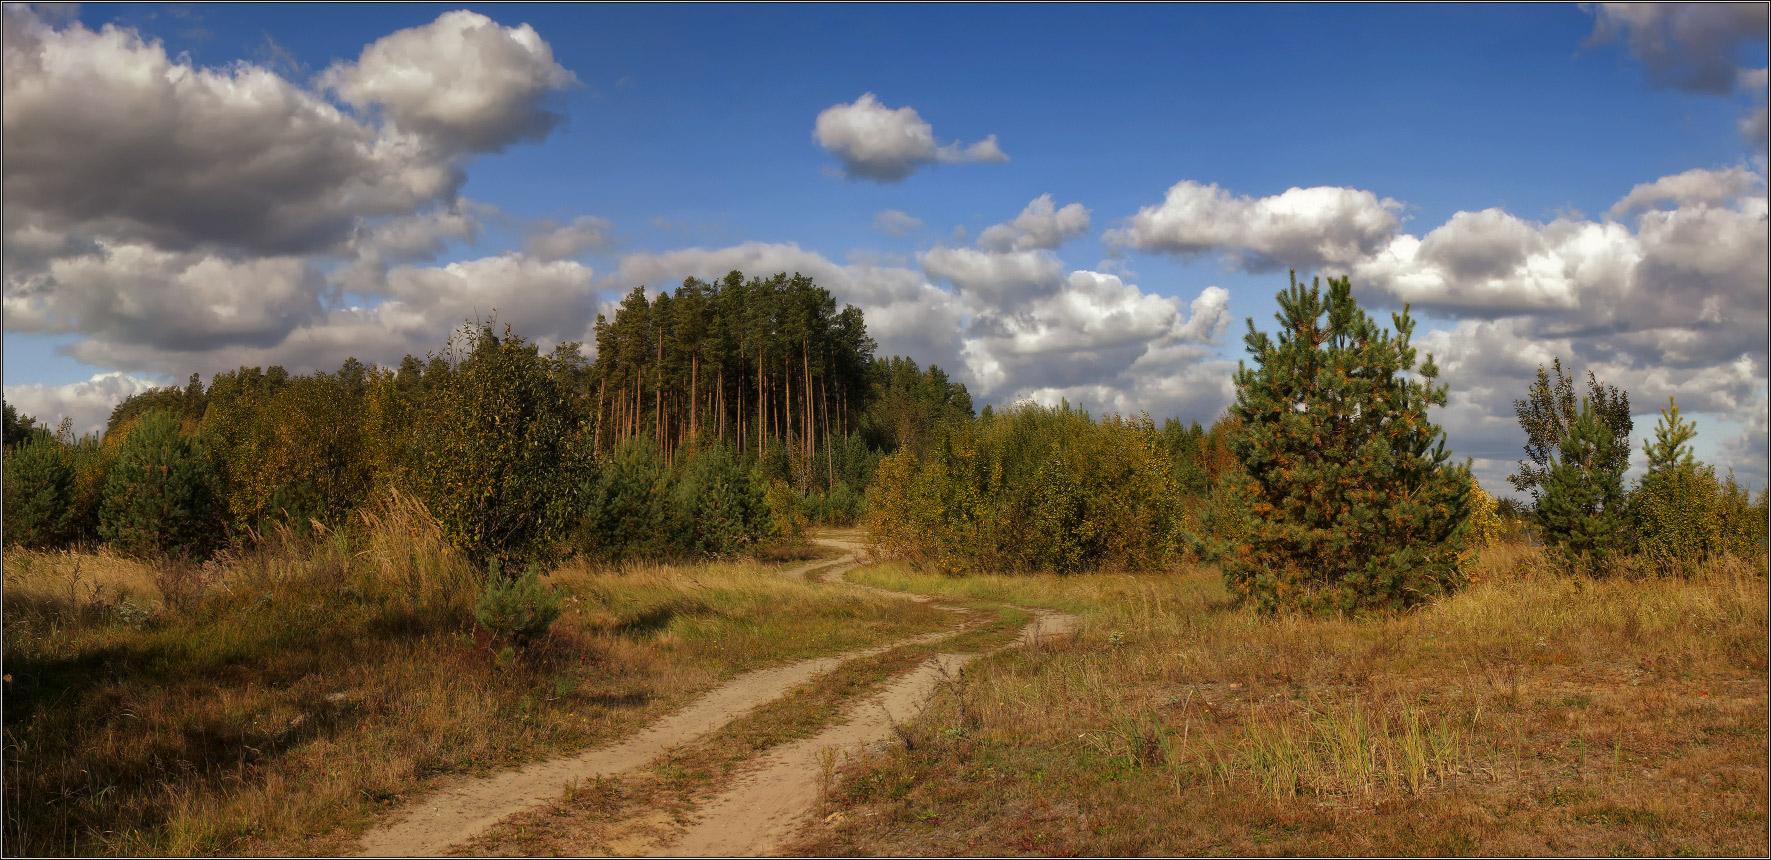 http://i3.imageban.ru/out/2011/10/02/64b55b6fc9b14875b4ea922972dfcd3e.jpg